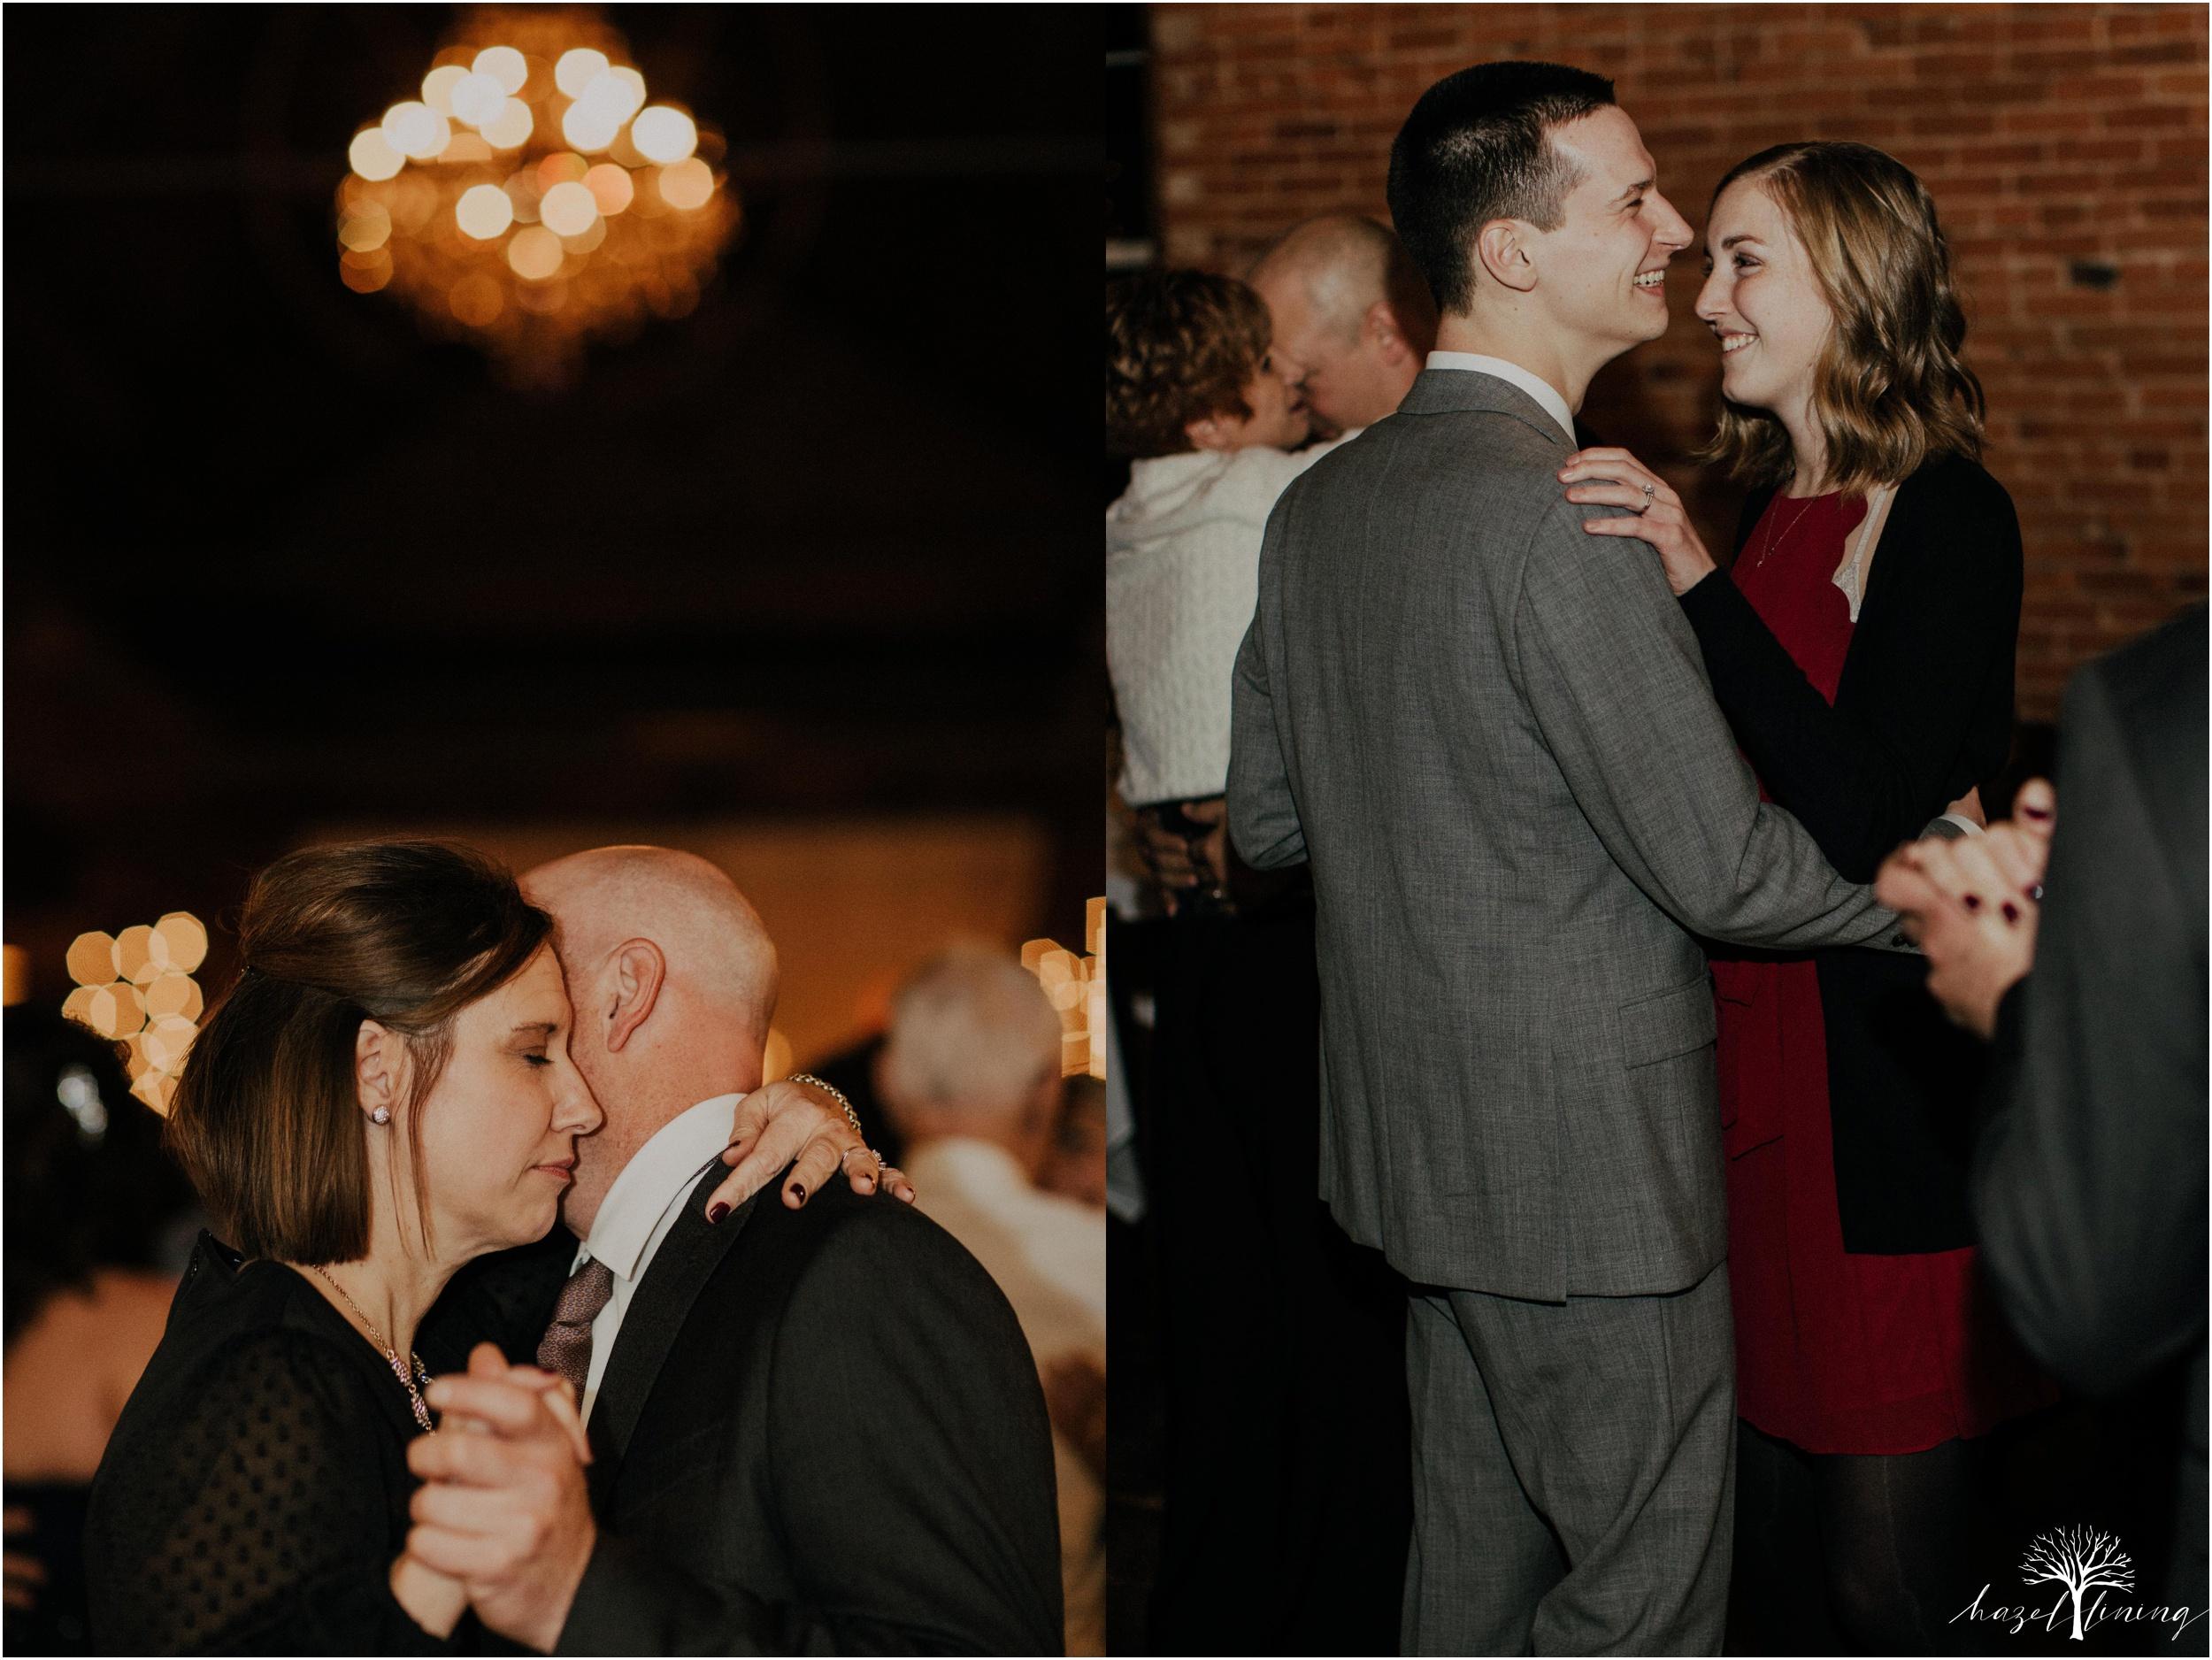 emma-matt-gehringer-the-booking-house-lancaster-manhiem-pennsylvania-winter-wedding_0176.jpg